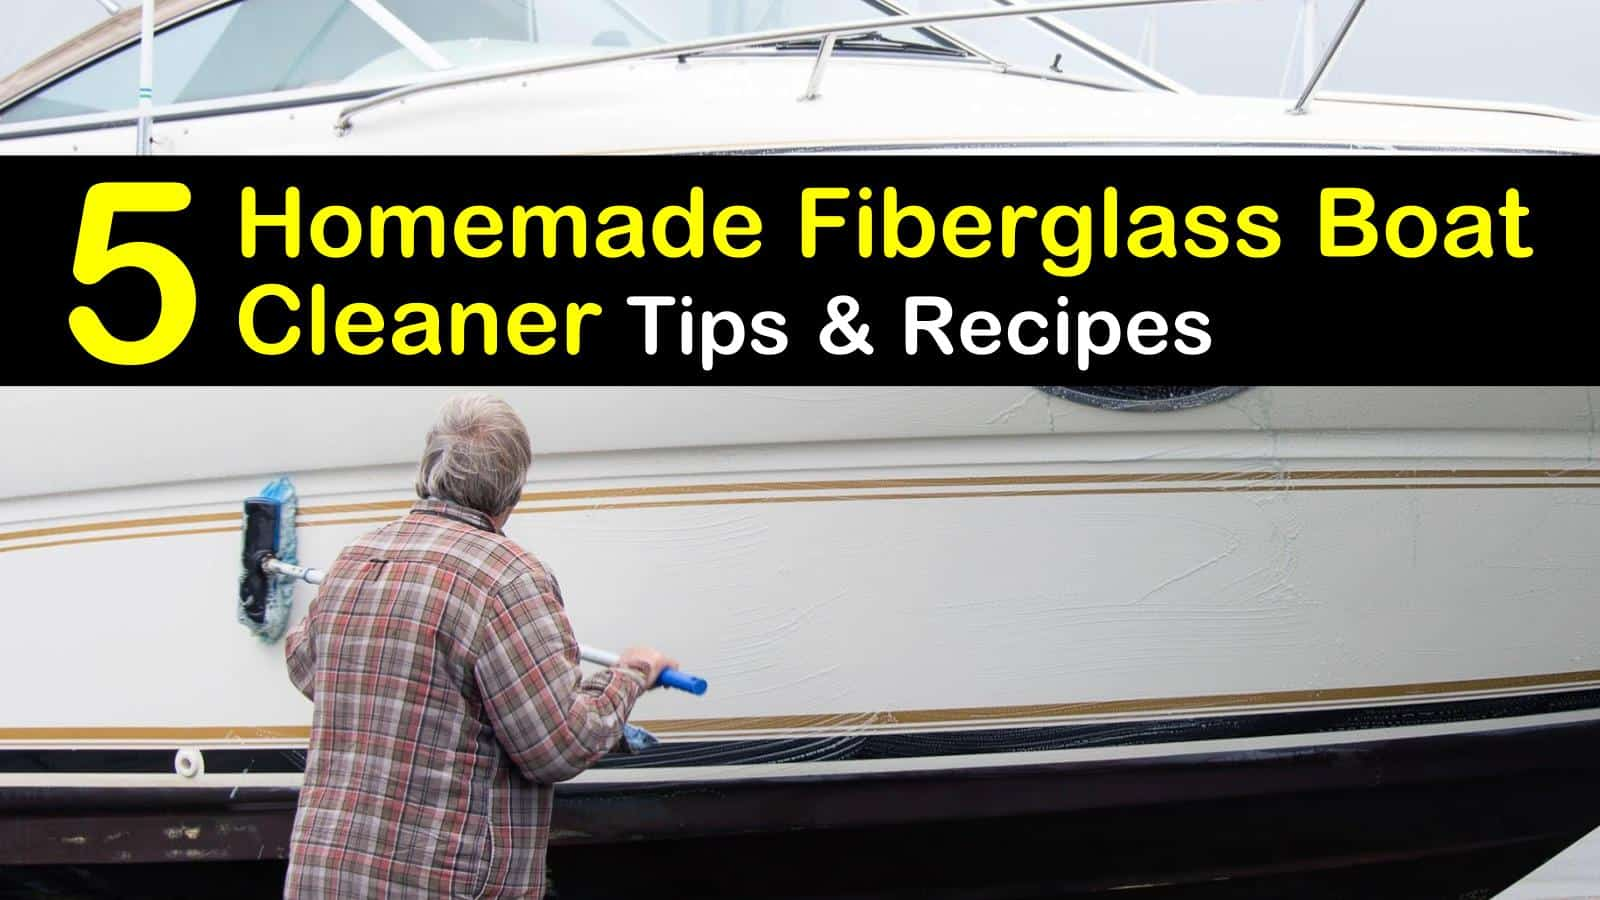 homemade fiberglass boat cleaner titleimg1